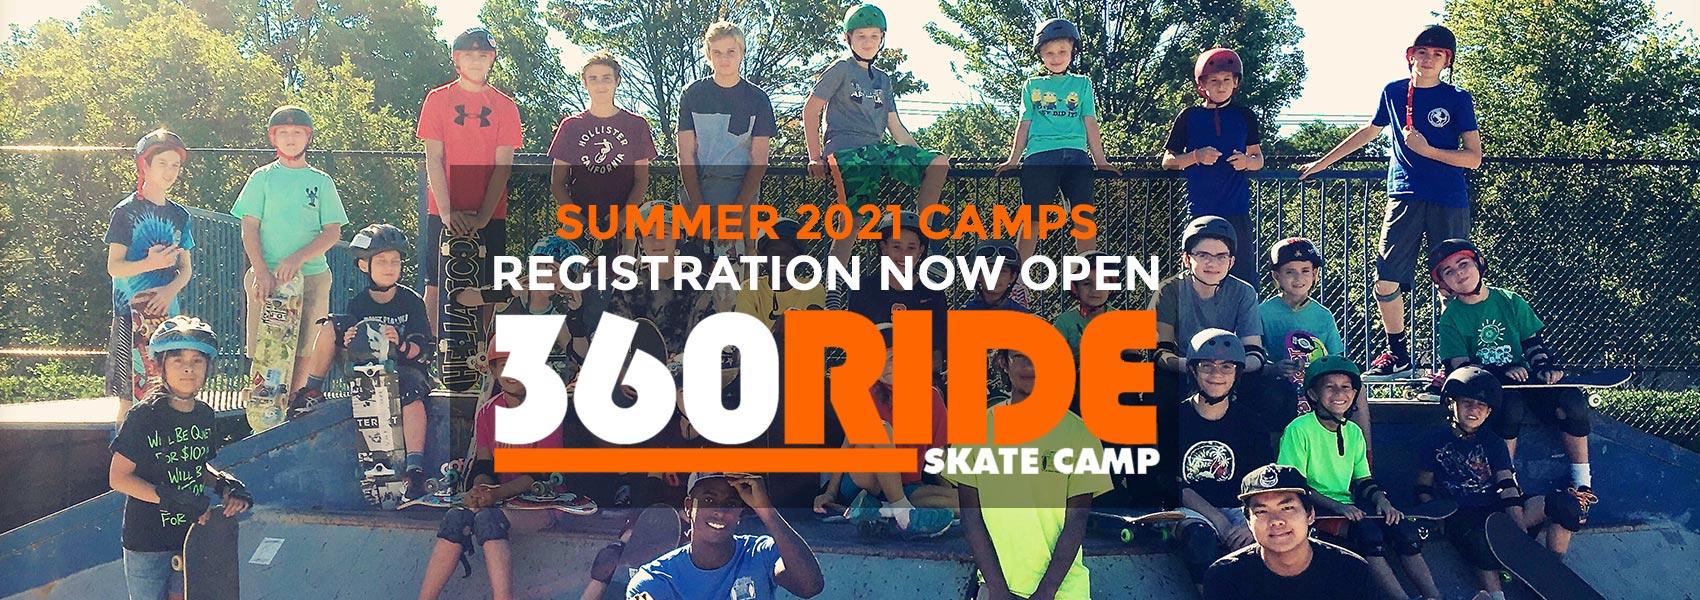 Summer 2021 Skate Camp